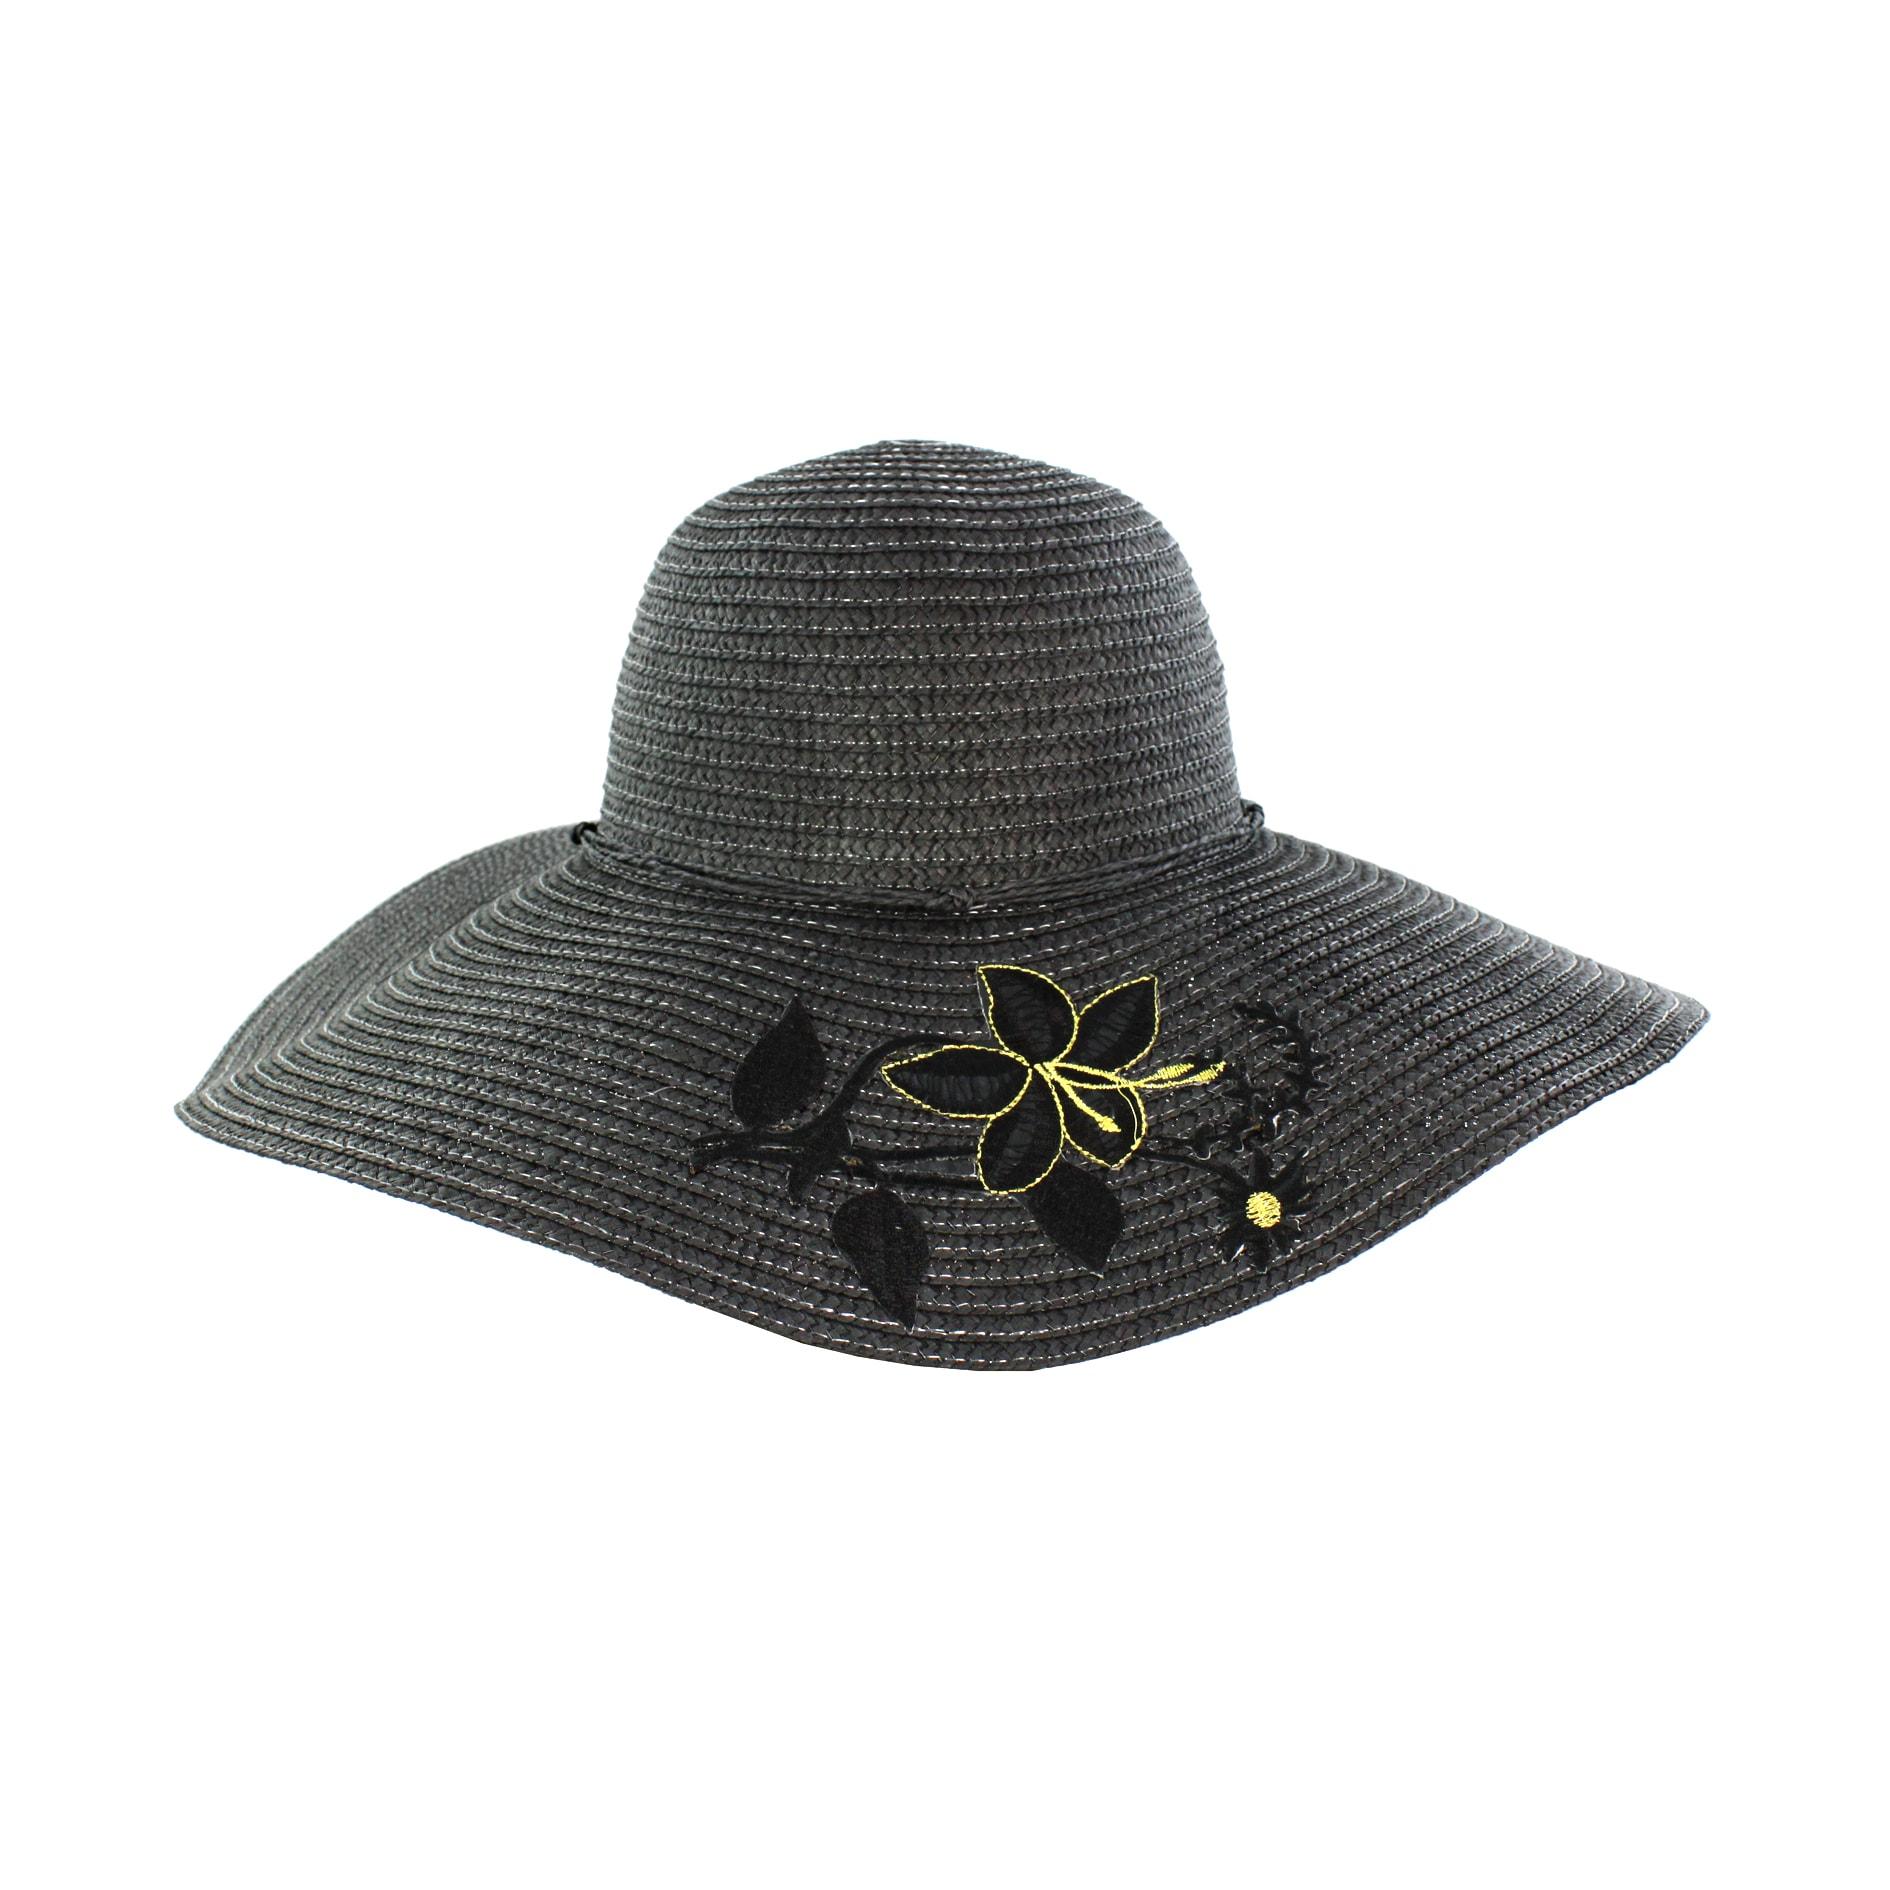 Faddism Women's Black Flower Straw Sun Hat